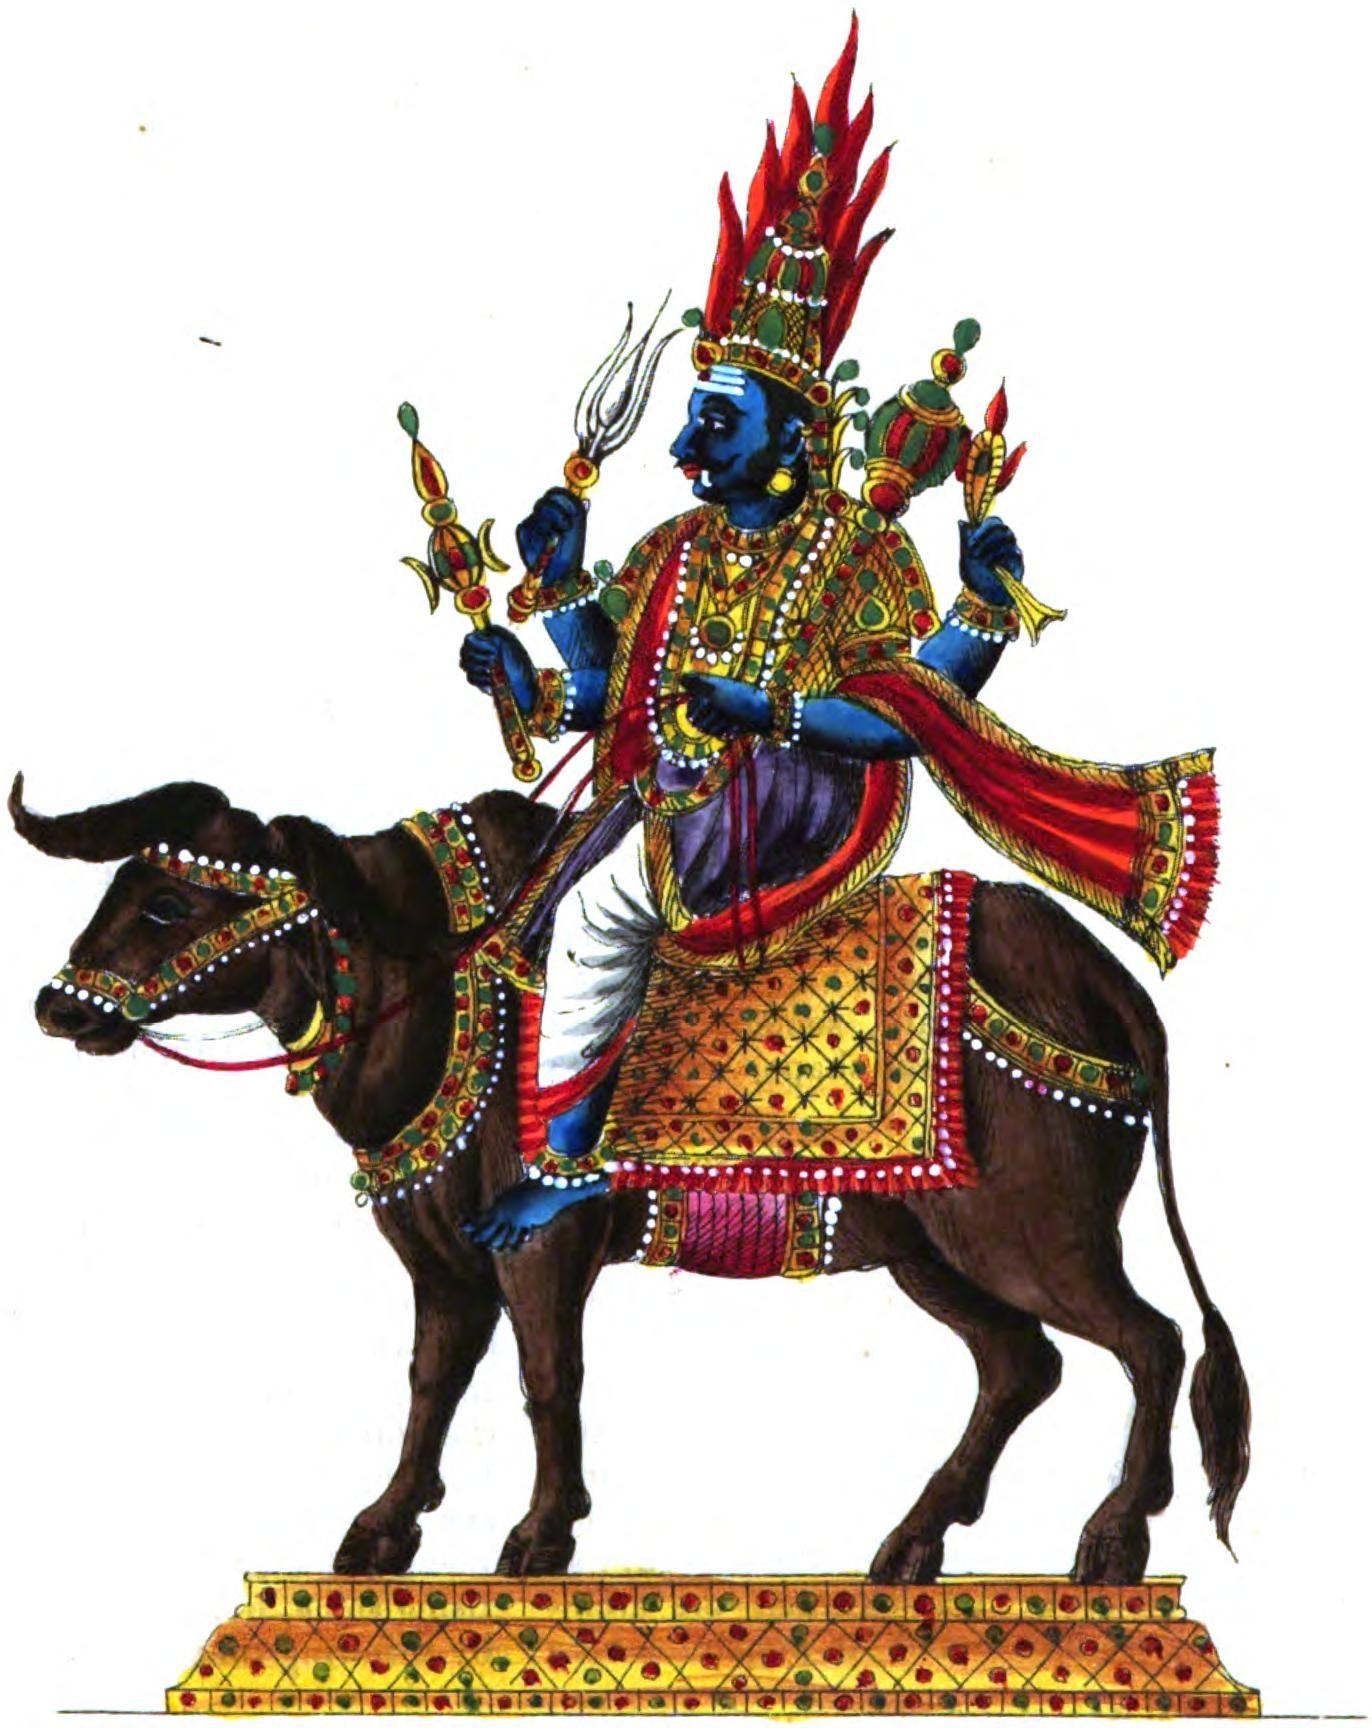 Thiruppainjeeli Yama Dharmaraja Swamy Temple11 Jpg Jpeg Image